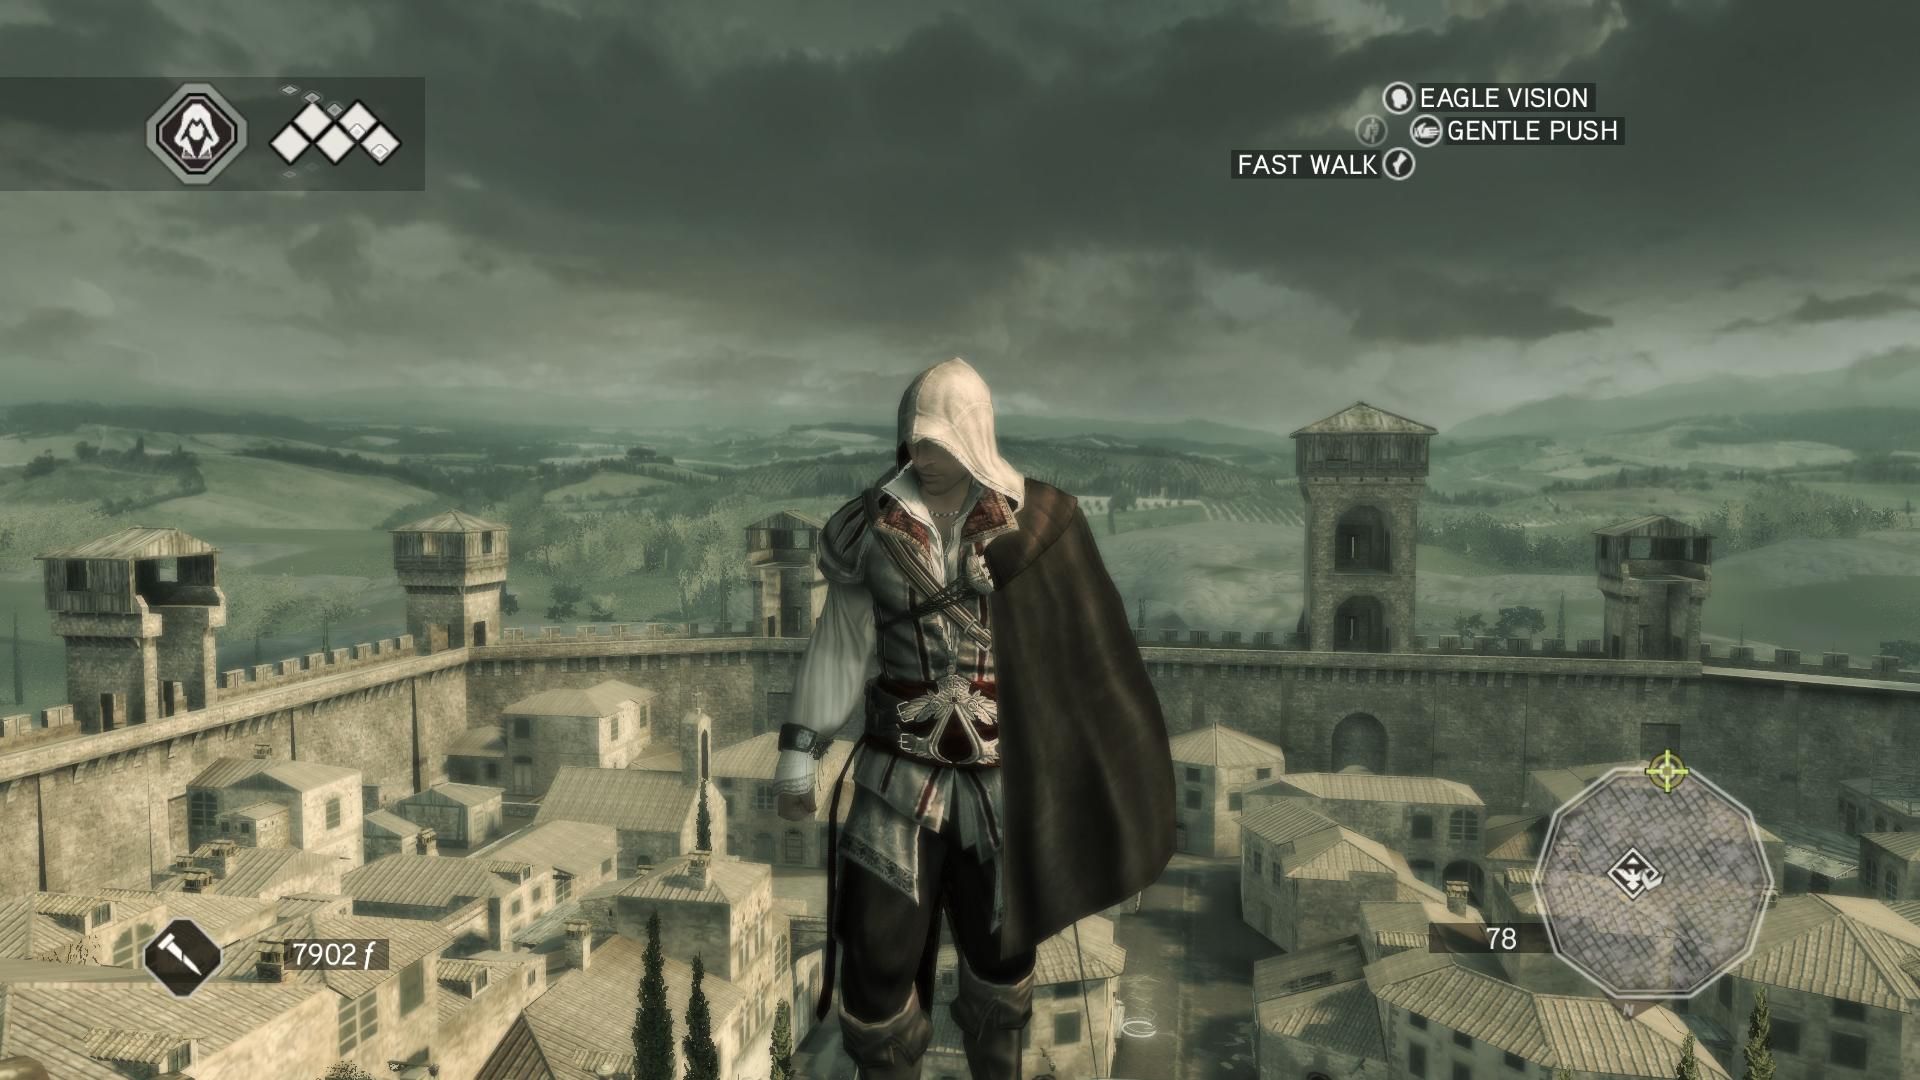 Assassins creed 2 download tpb